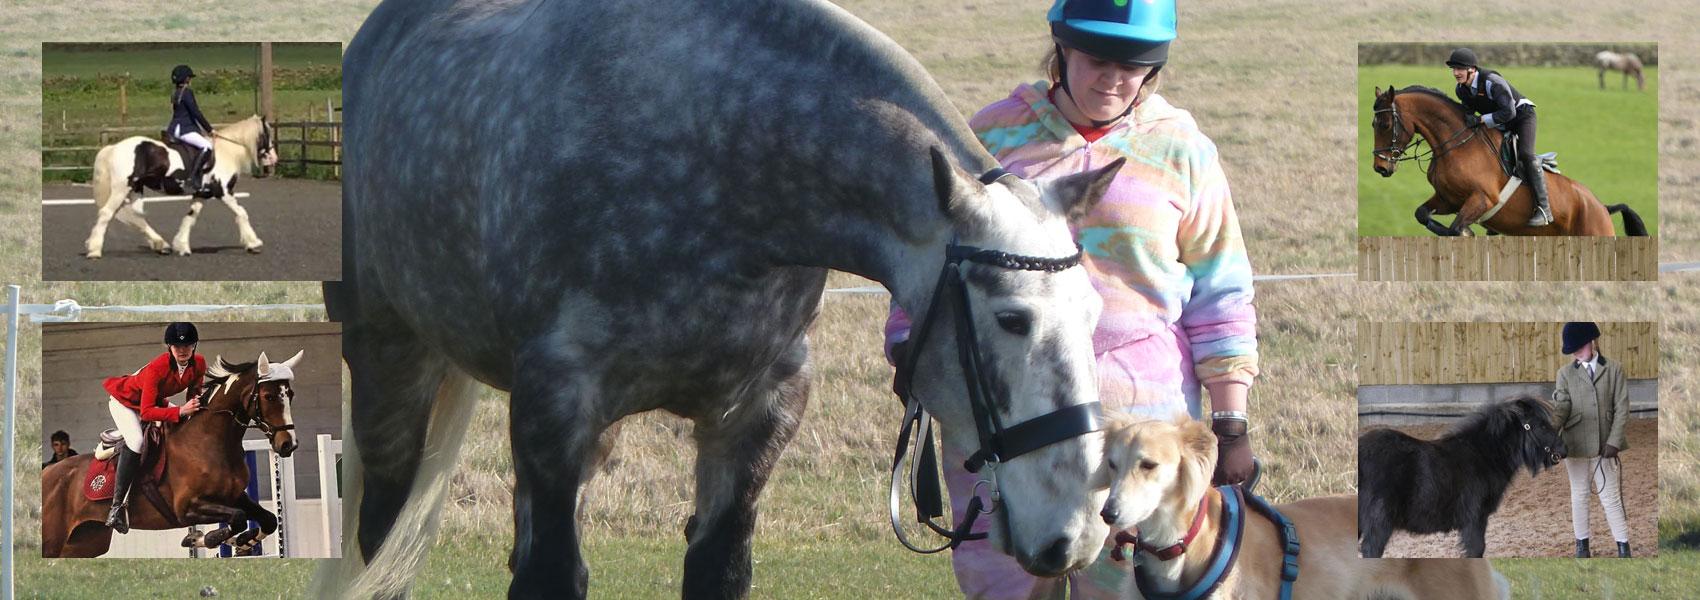 Penistone & District Riding Club Montage